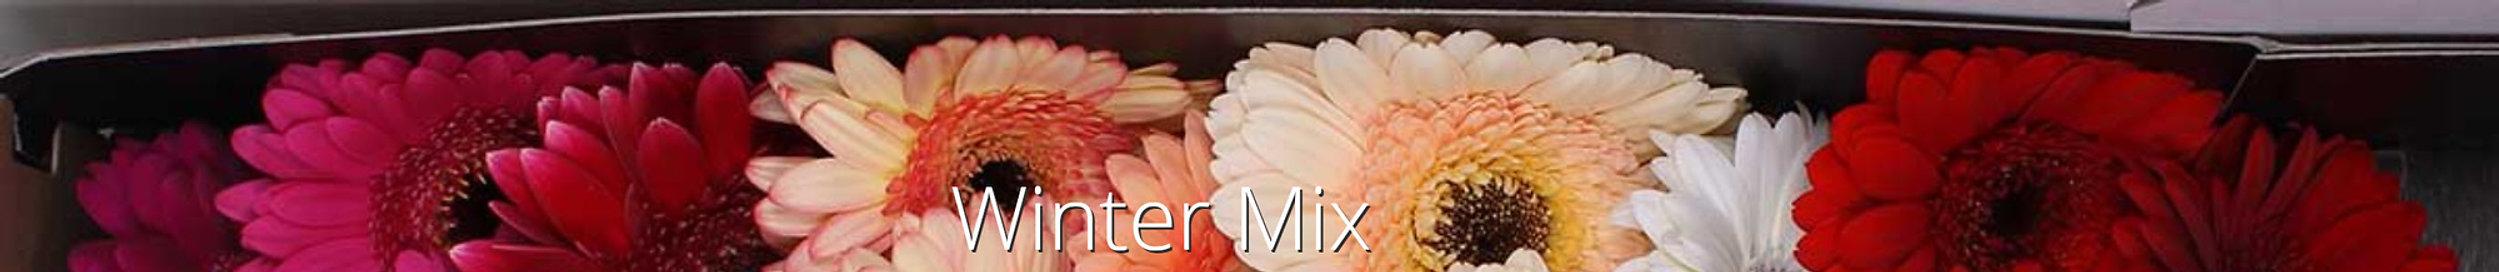 winter mix.jpg